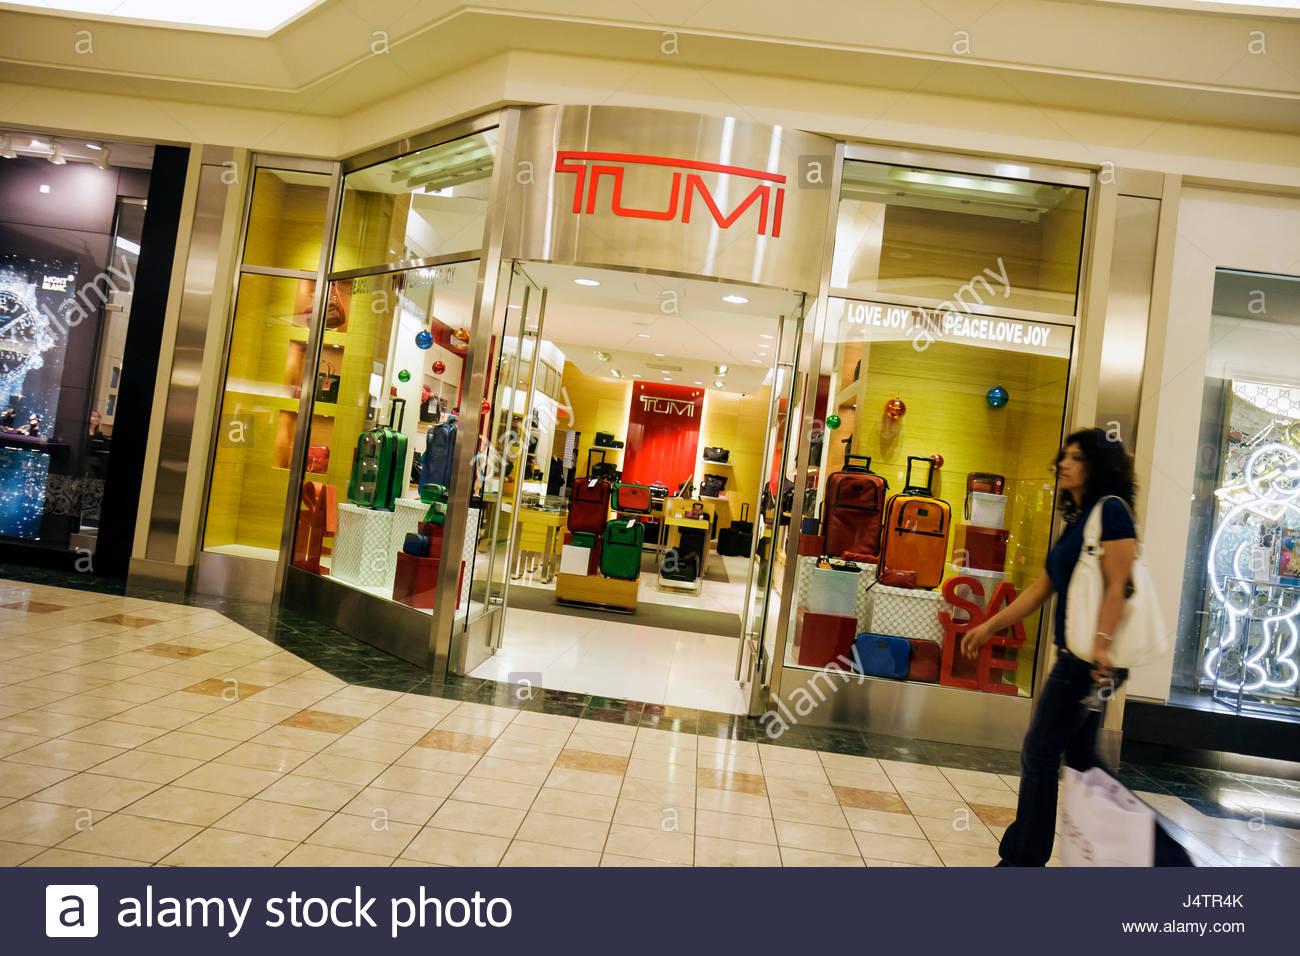 Palm Beach Florida Gardens The Gardens Mall Tumi Store Business Stock Photo Royalty Free Image